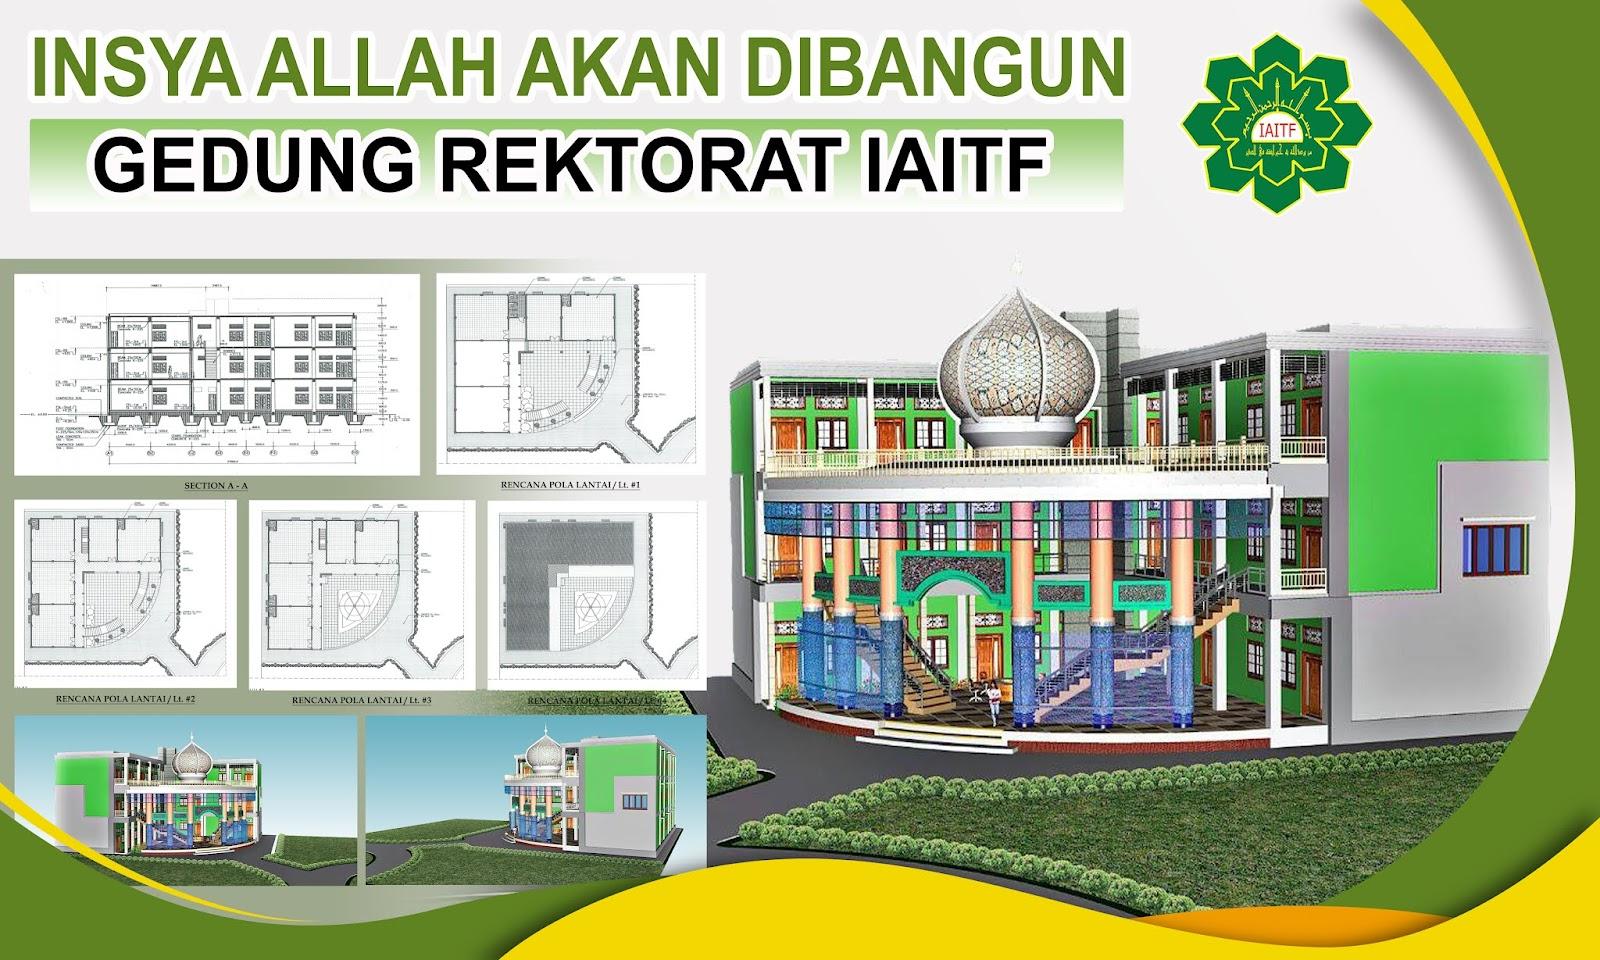 Open Donasi Pembangunan Rektorat IAITF